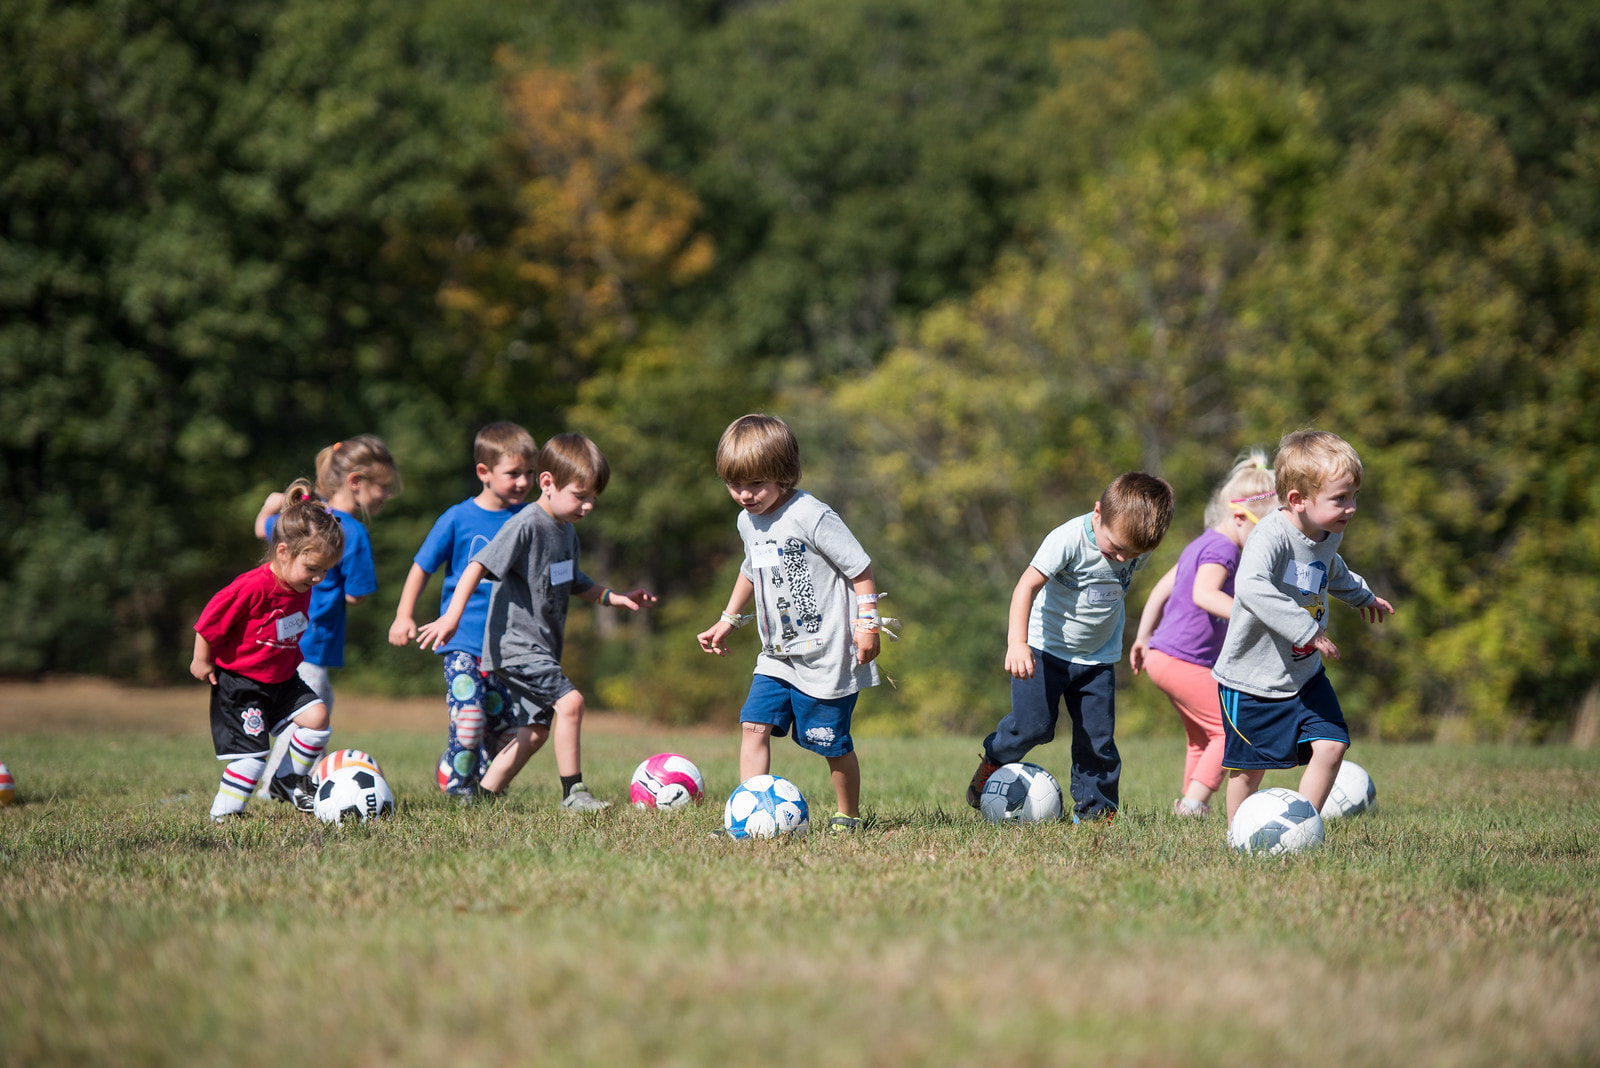 Picture of children kicking soccer balls